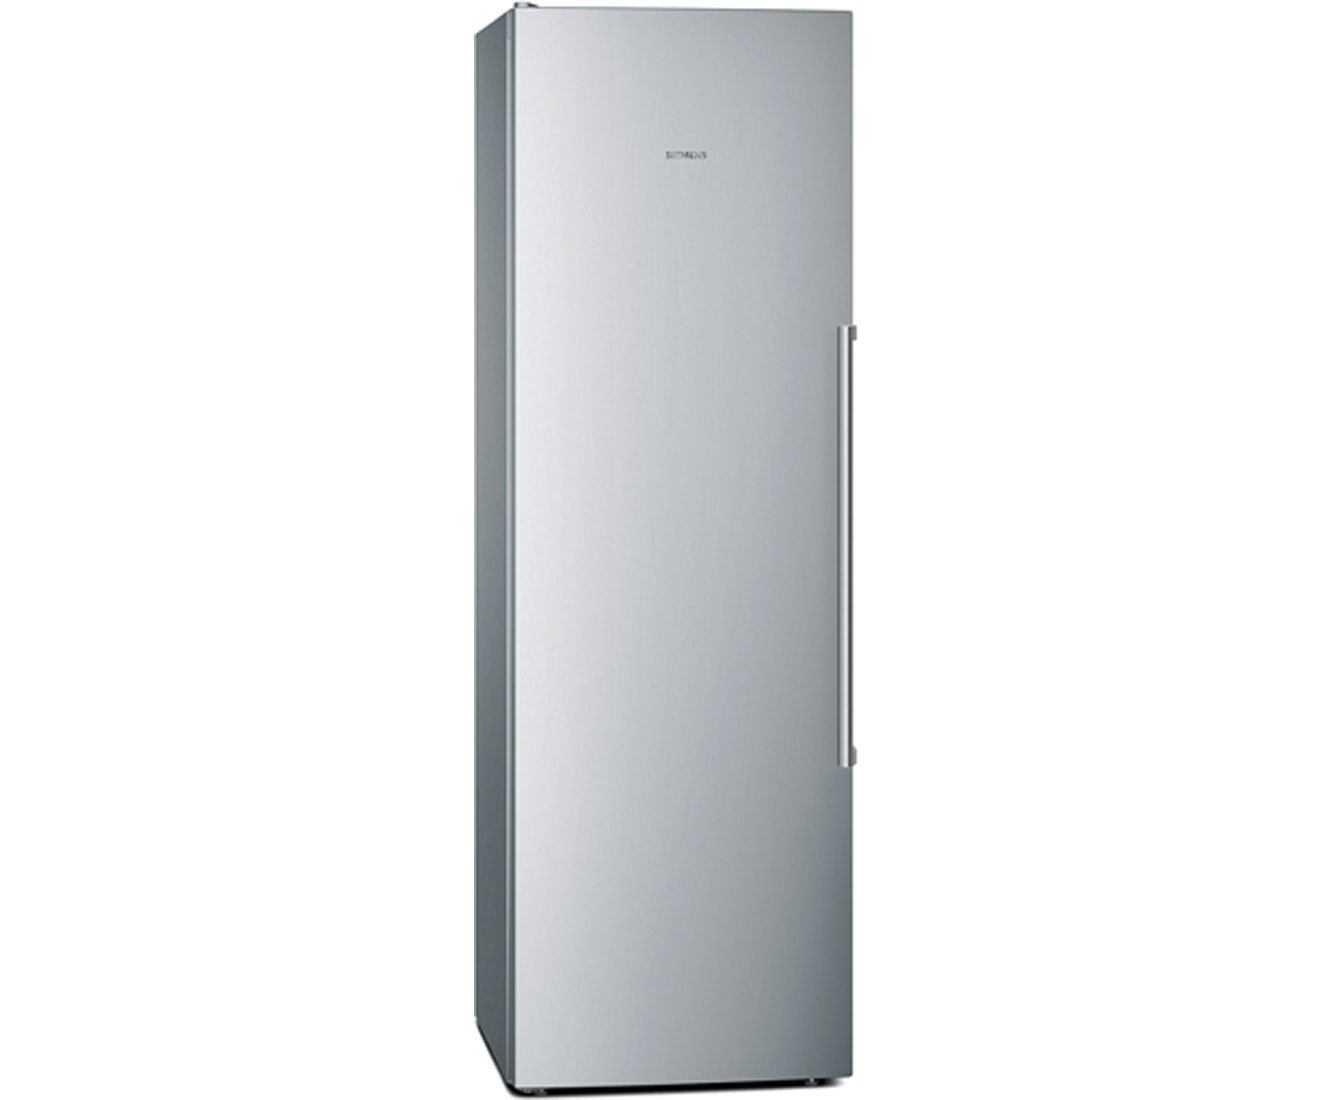 Gorenje Kühlschrank R6192fx : Freistehender kühlschrank edelstahl siemens kg vvl kühl